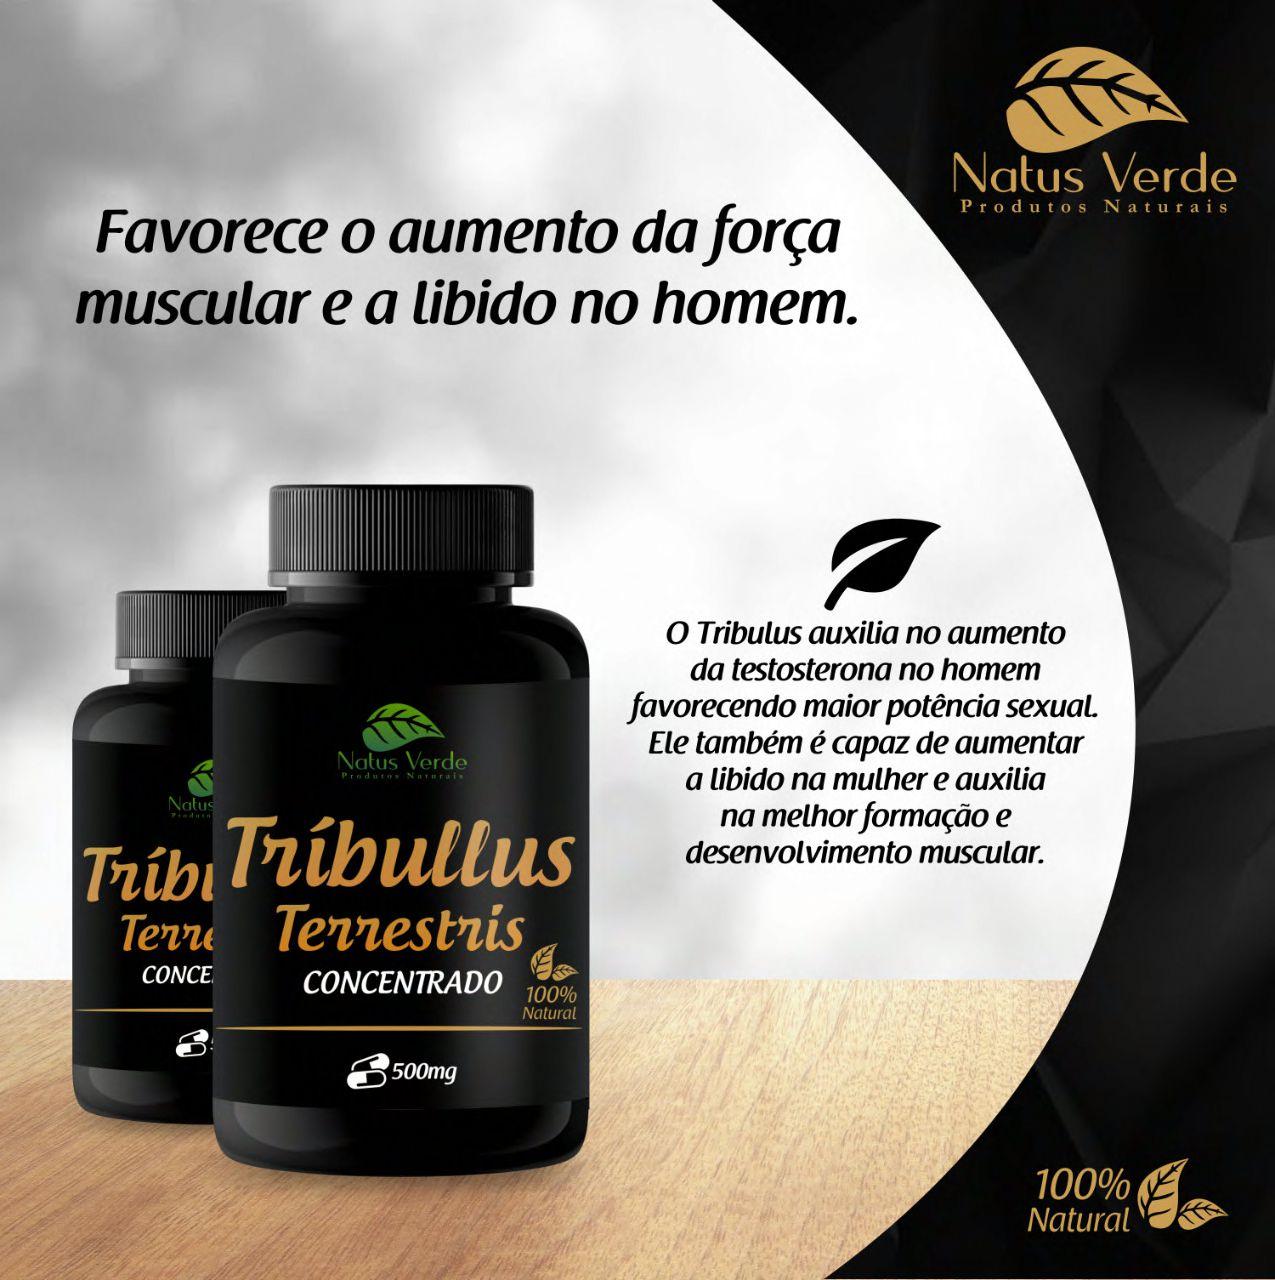 Produto Natural Tríbullus Terrestris Concentrado 60 caps Natus Verde  - Fribasex - Fabricasex.com